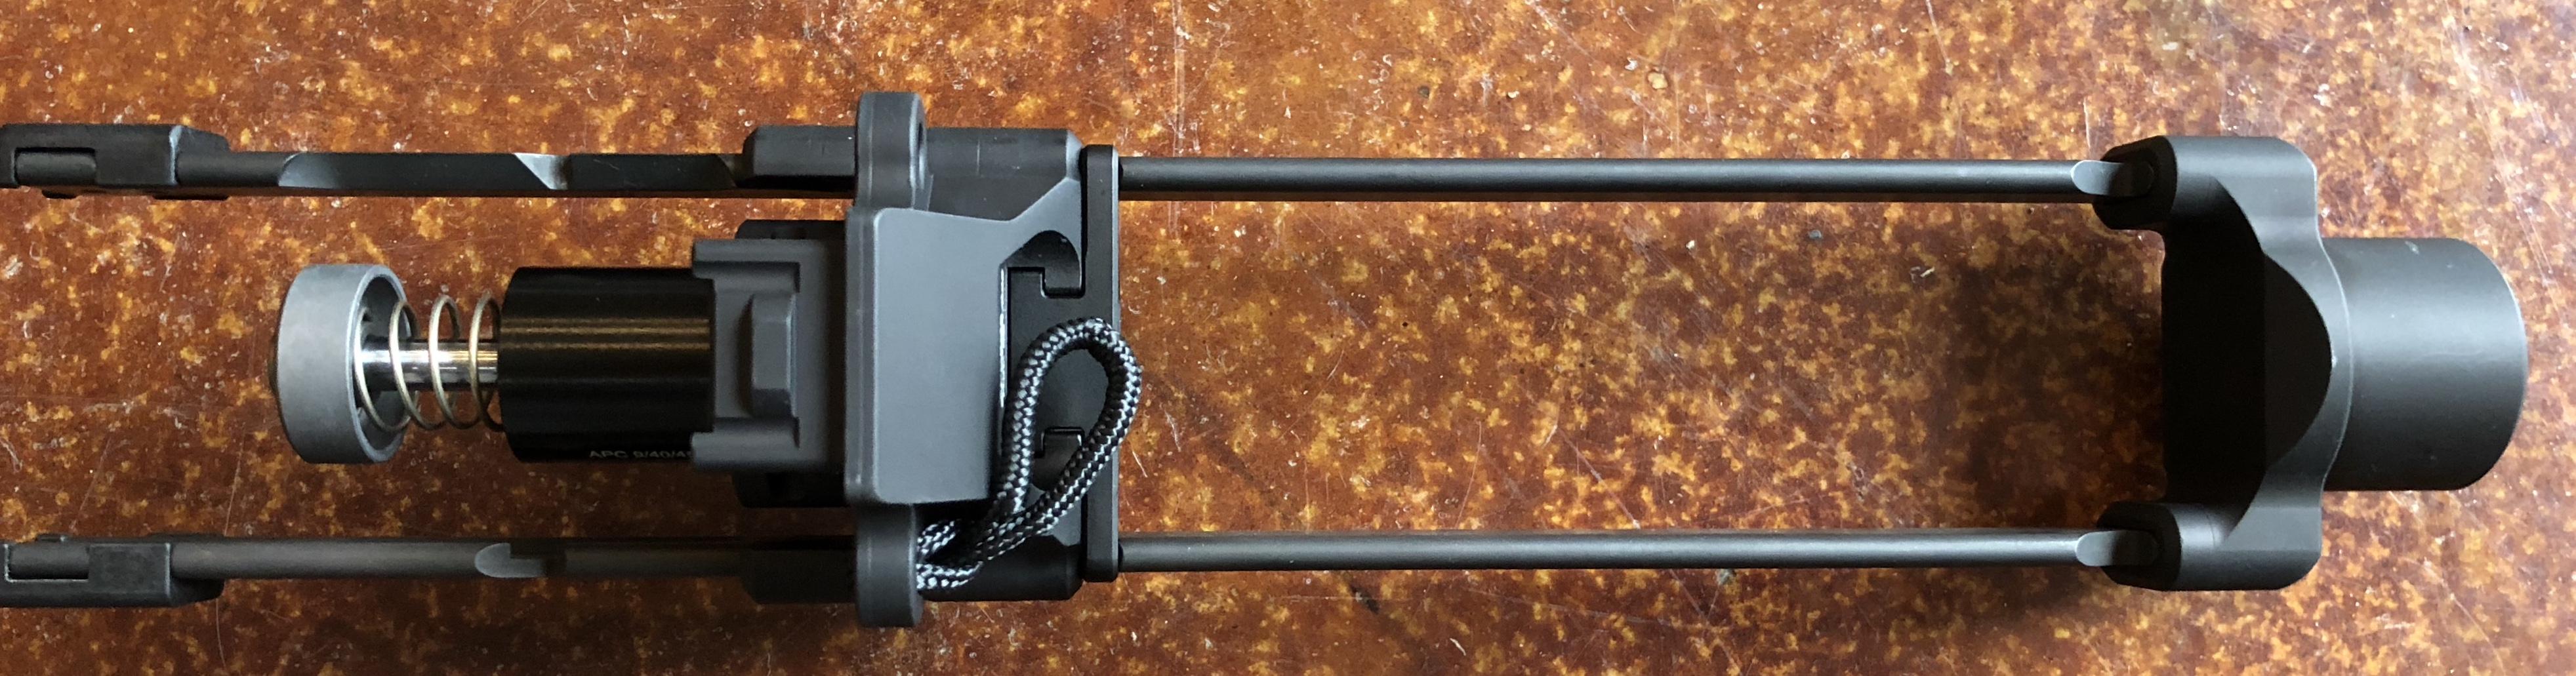 B&T Telescopic Brace for APC9 APC45